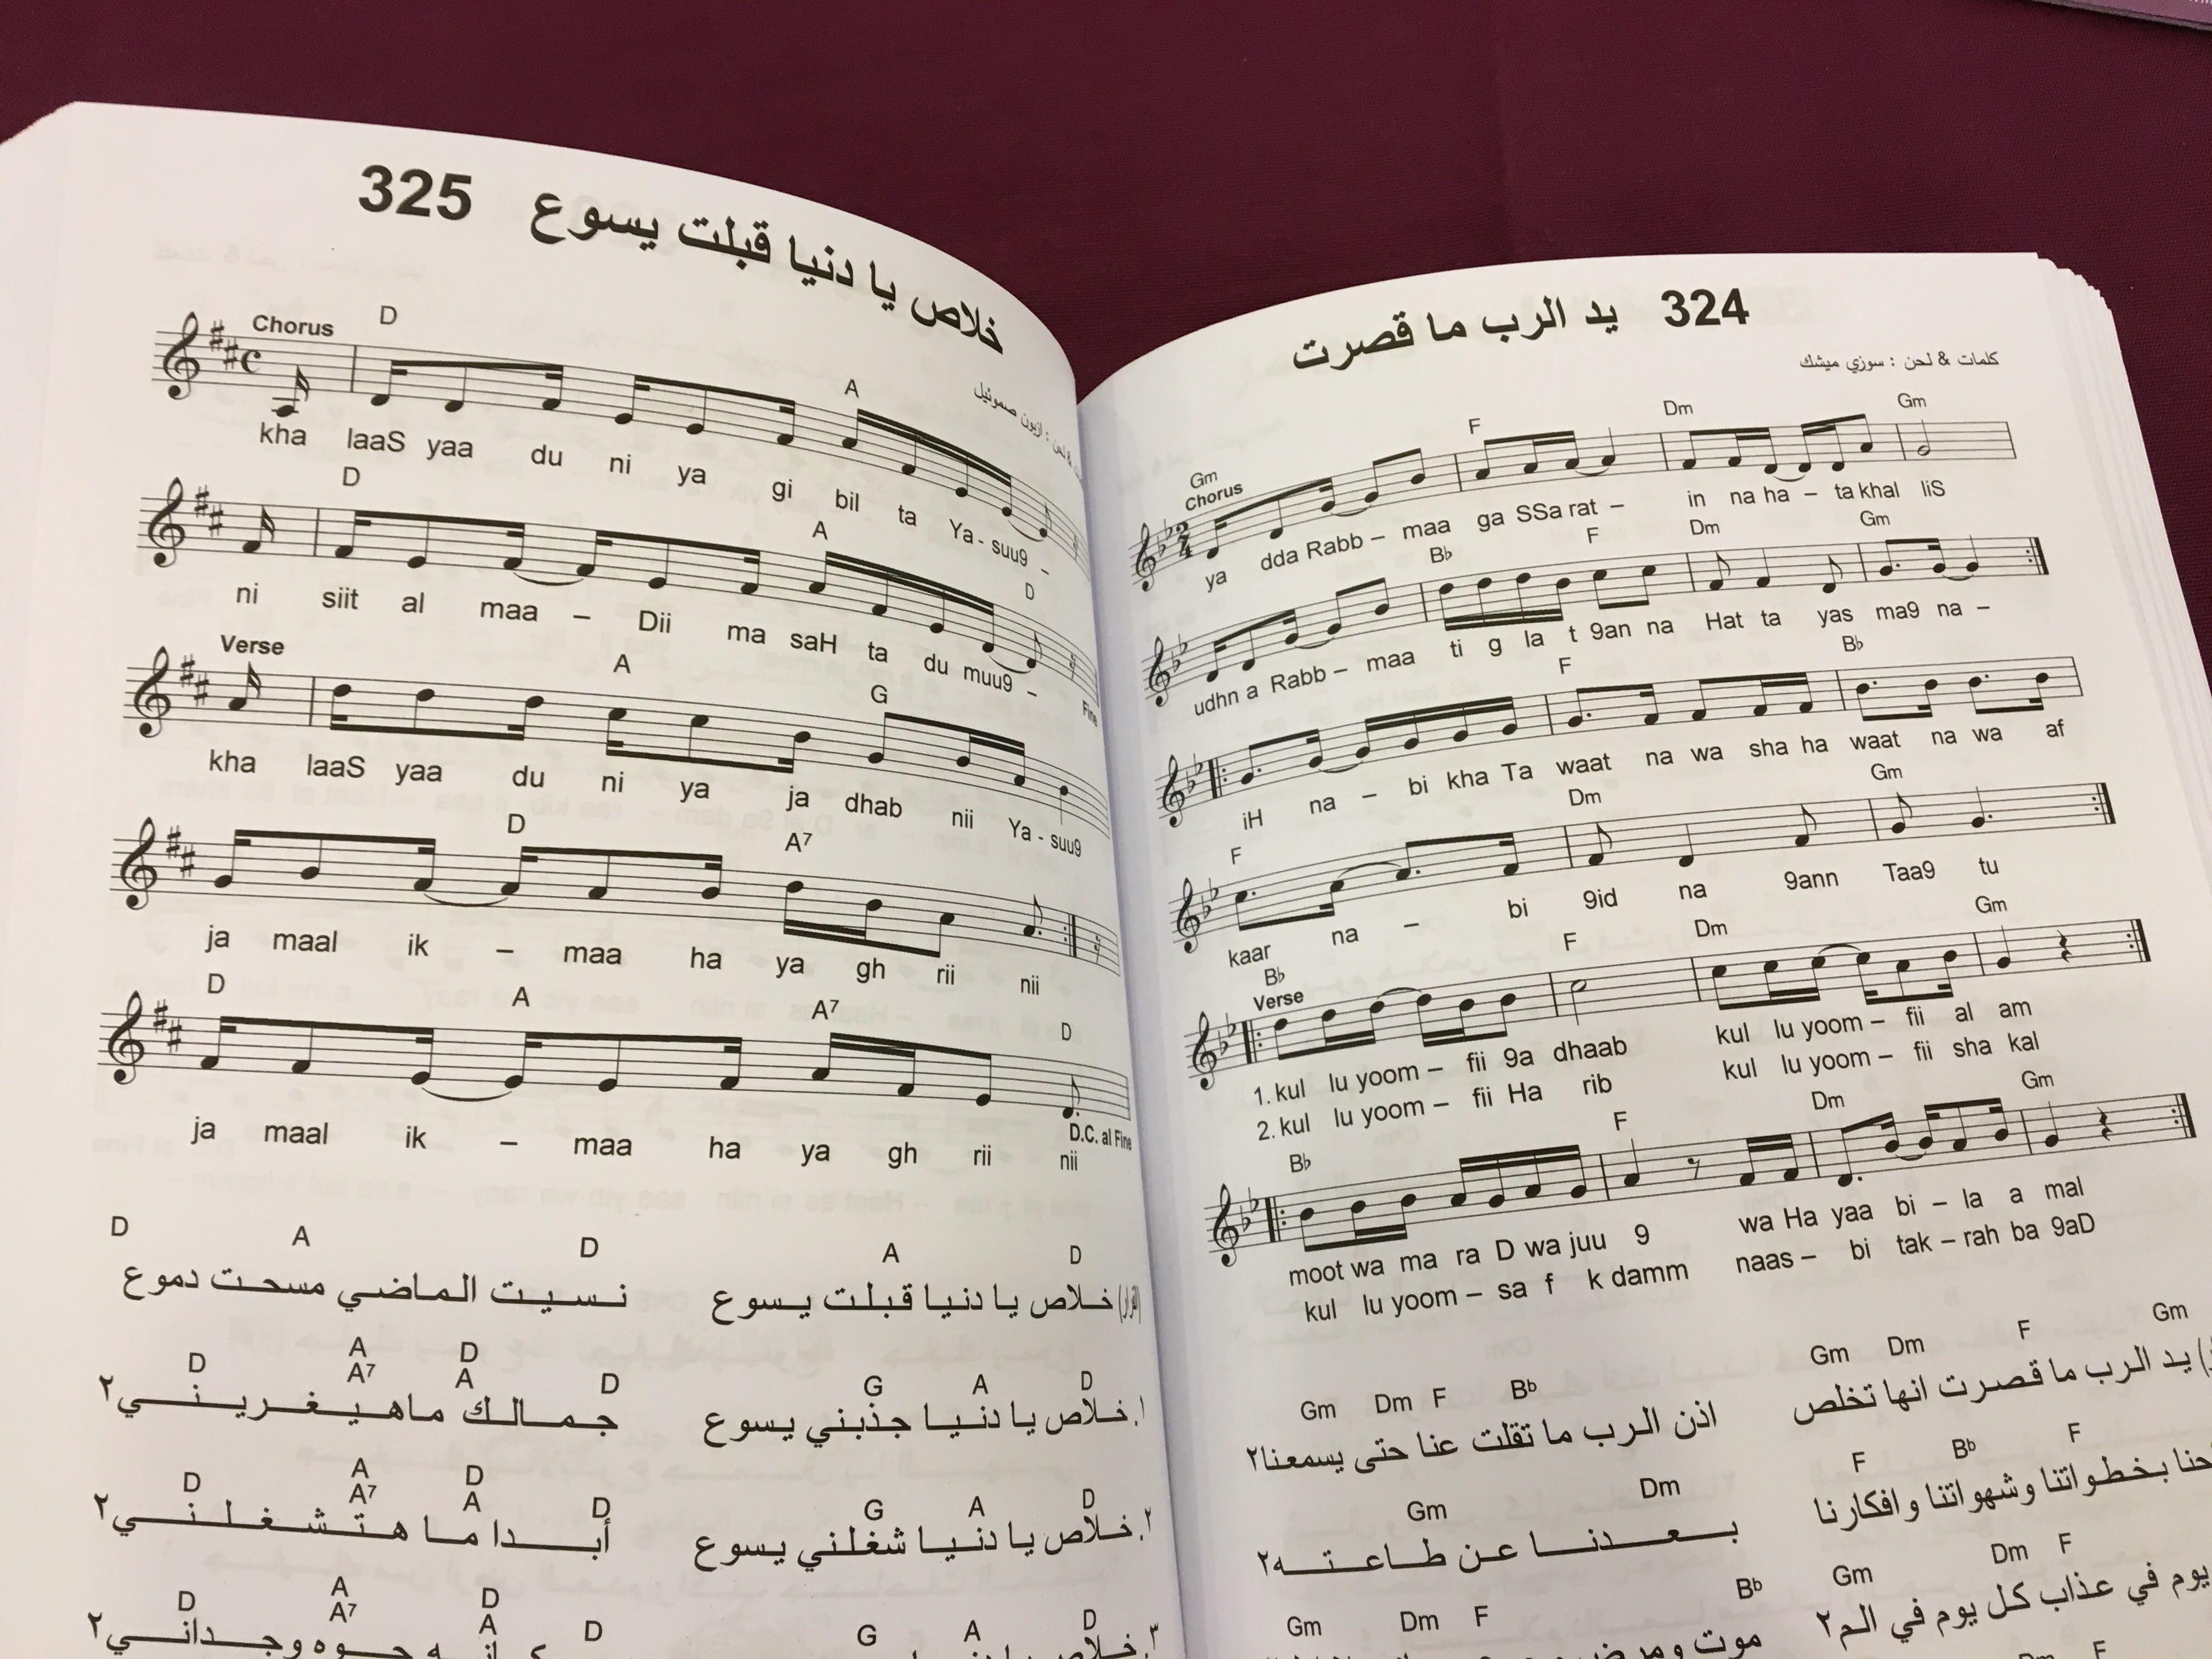 Historic hymnal brings joy to Sudanese Church